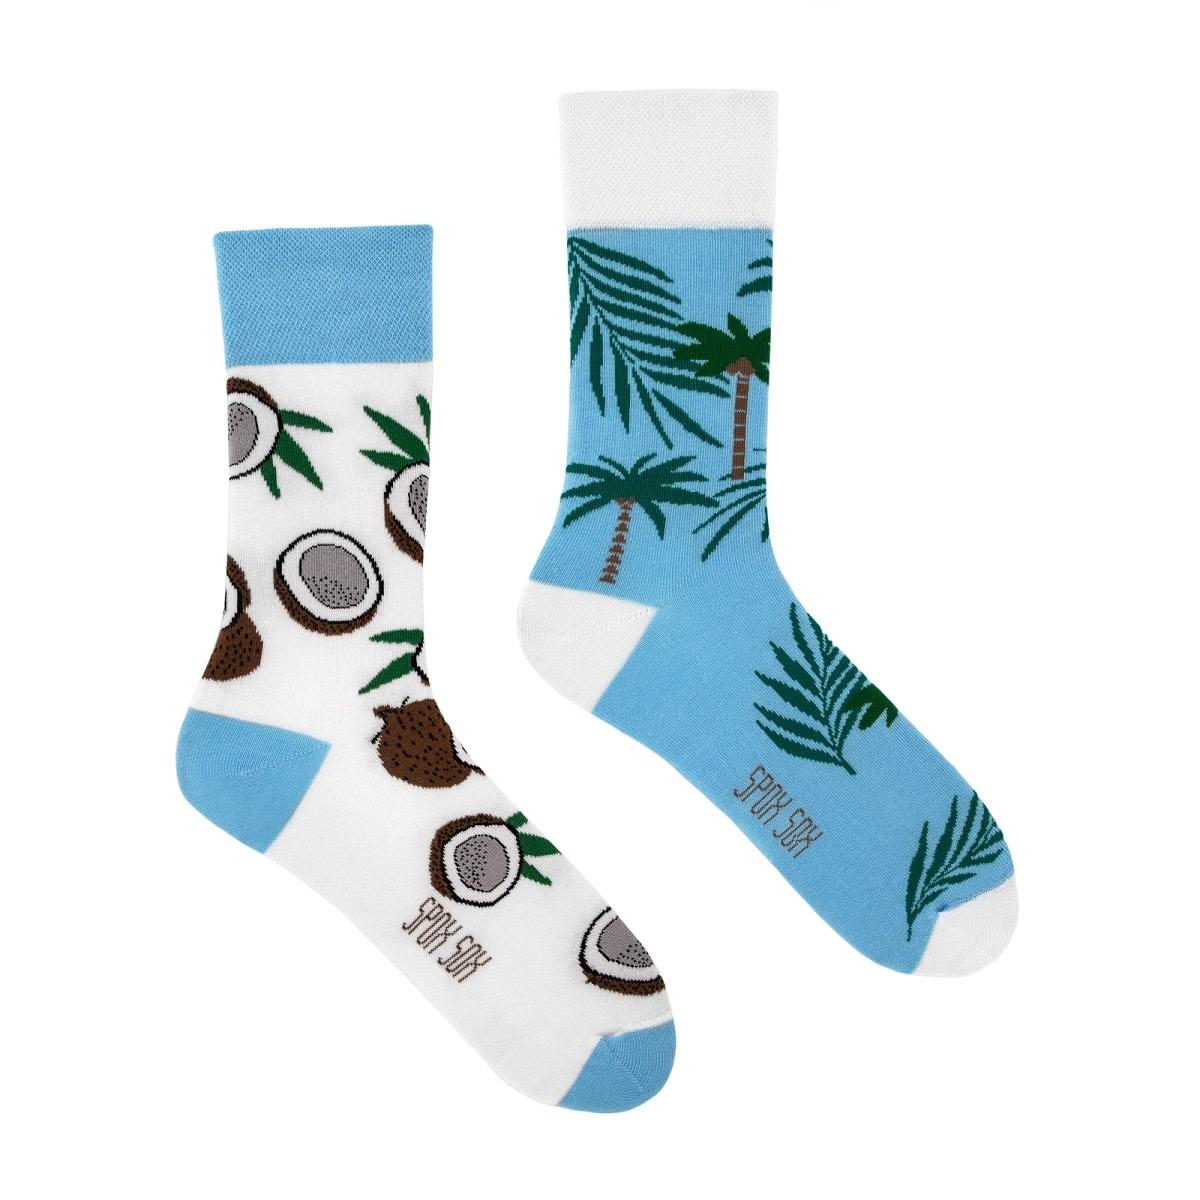 King Stone Socks Coco